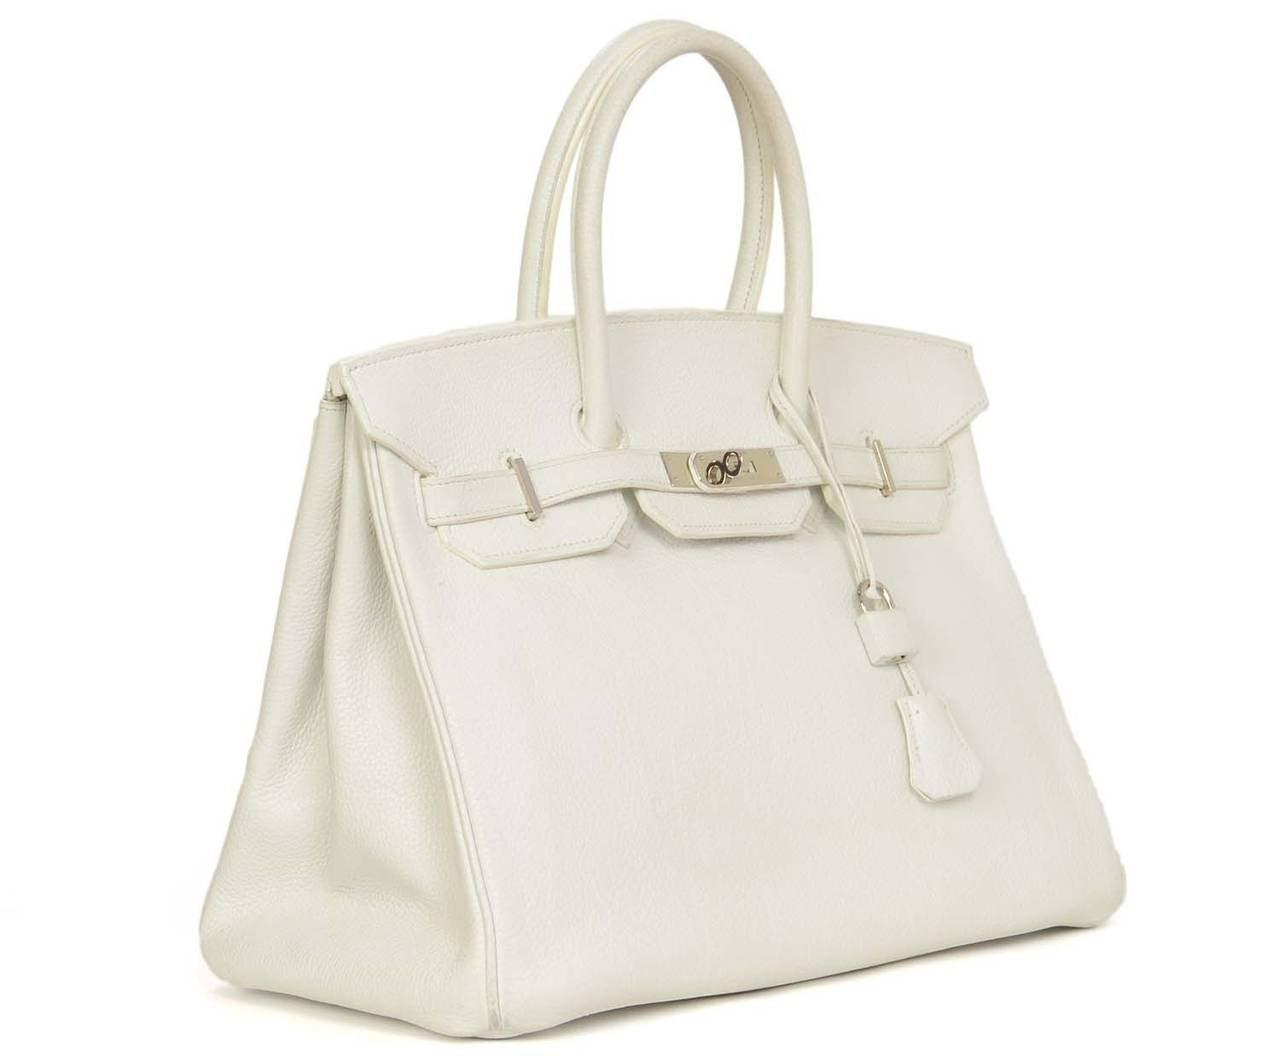 where to buy hermes bags online - HERMES 2007 White Clemence Leather 35 cm Birkin Bag at 1stdibs